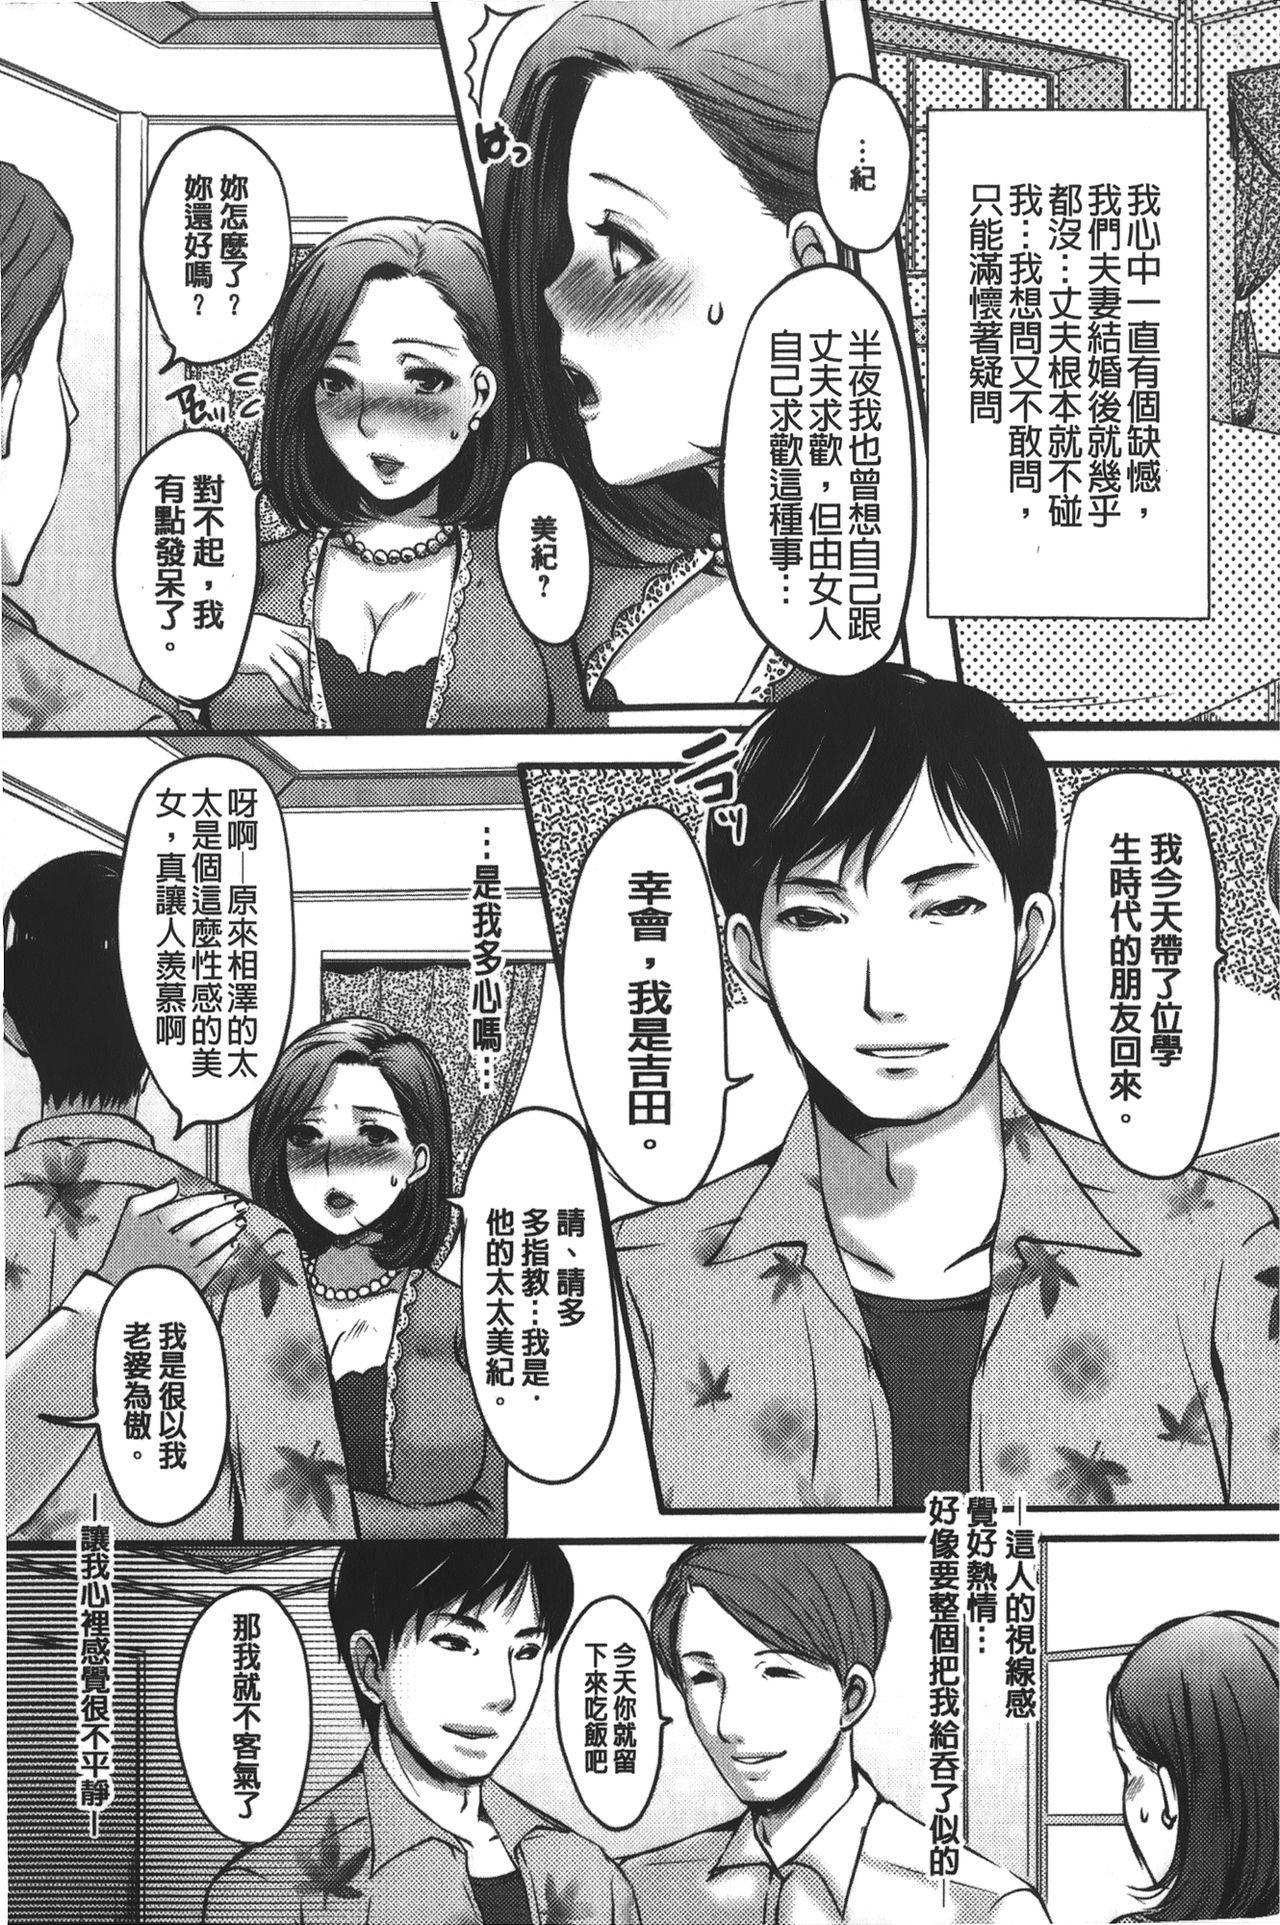 Kanjuku Torozuma 52